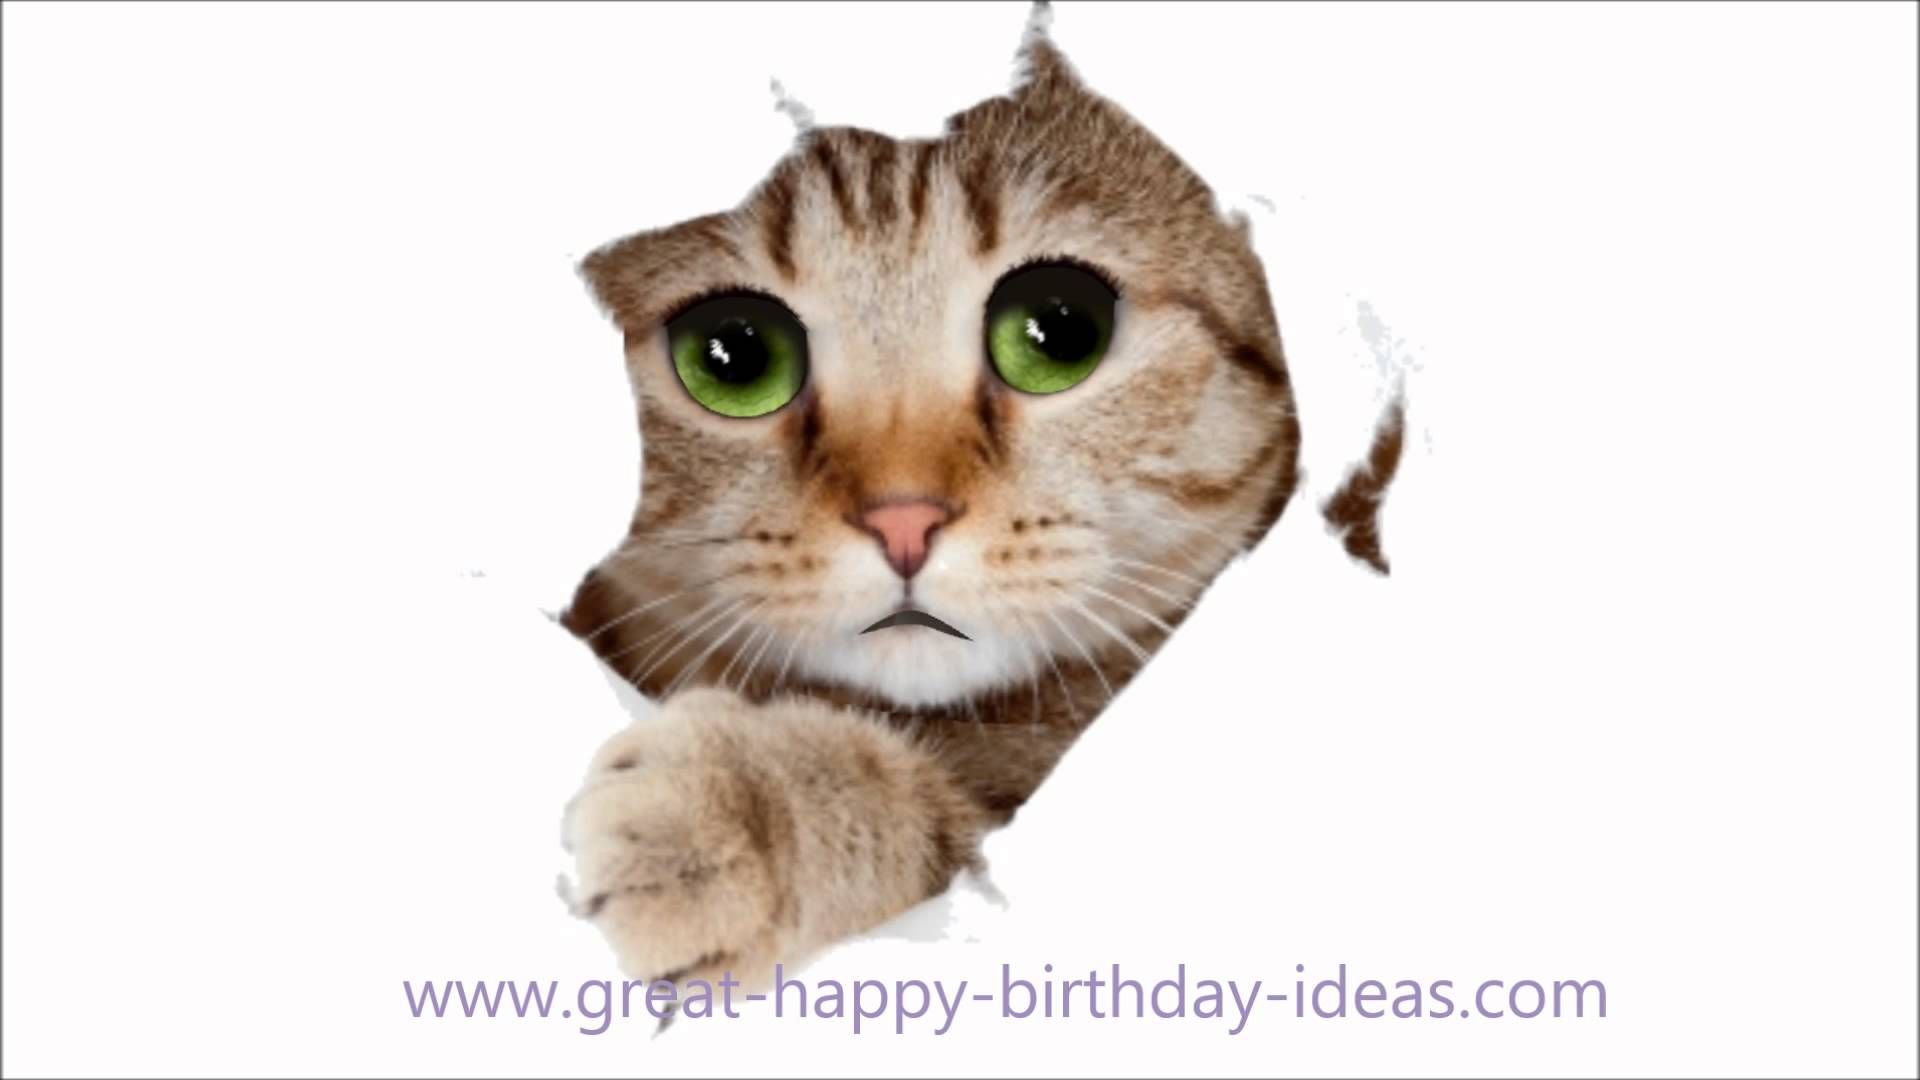 Have a VERY Happy Birthday Very happy birthday, Happy